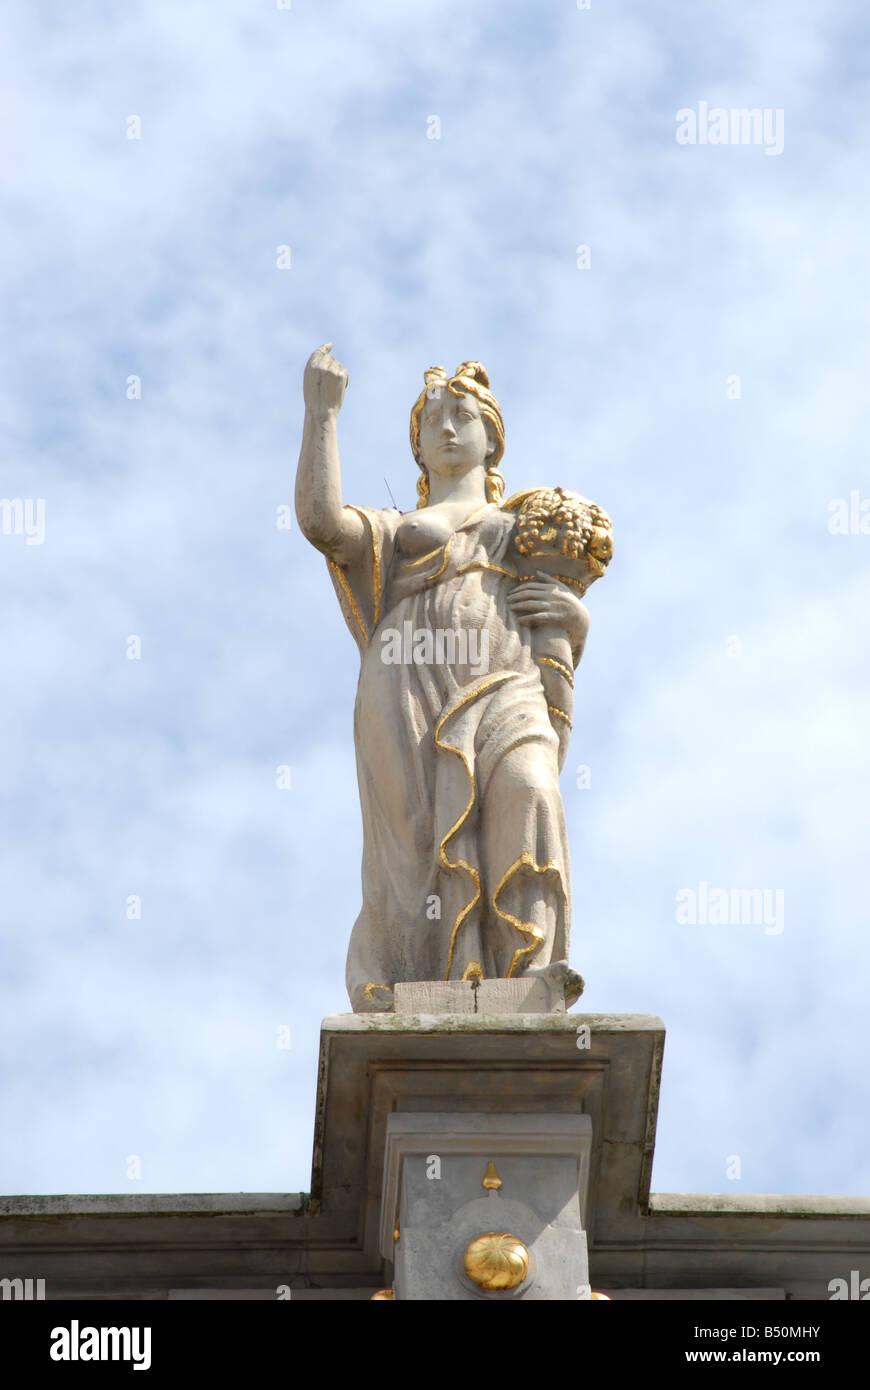 Estatuas de mujeres en el Golden Gate Zlota Brama Gdansk, Polonia Imagen De Stock